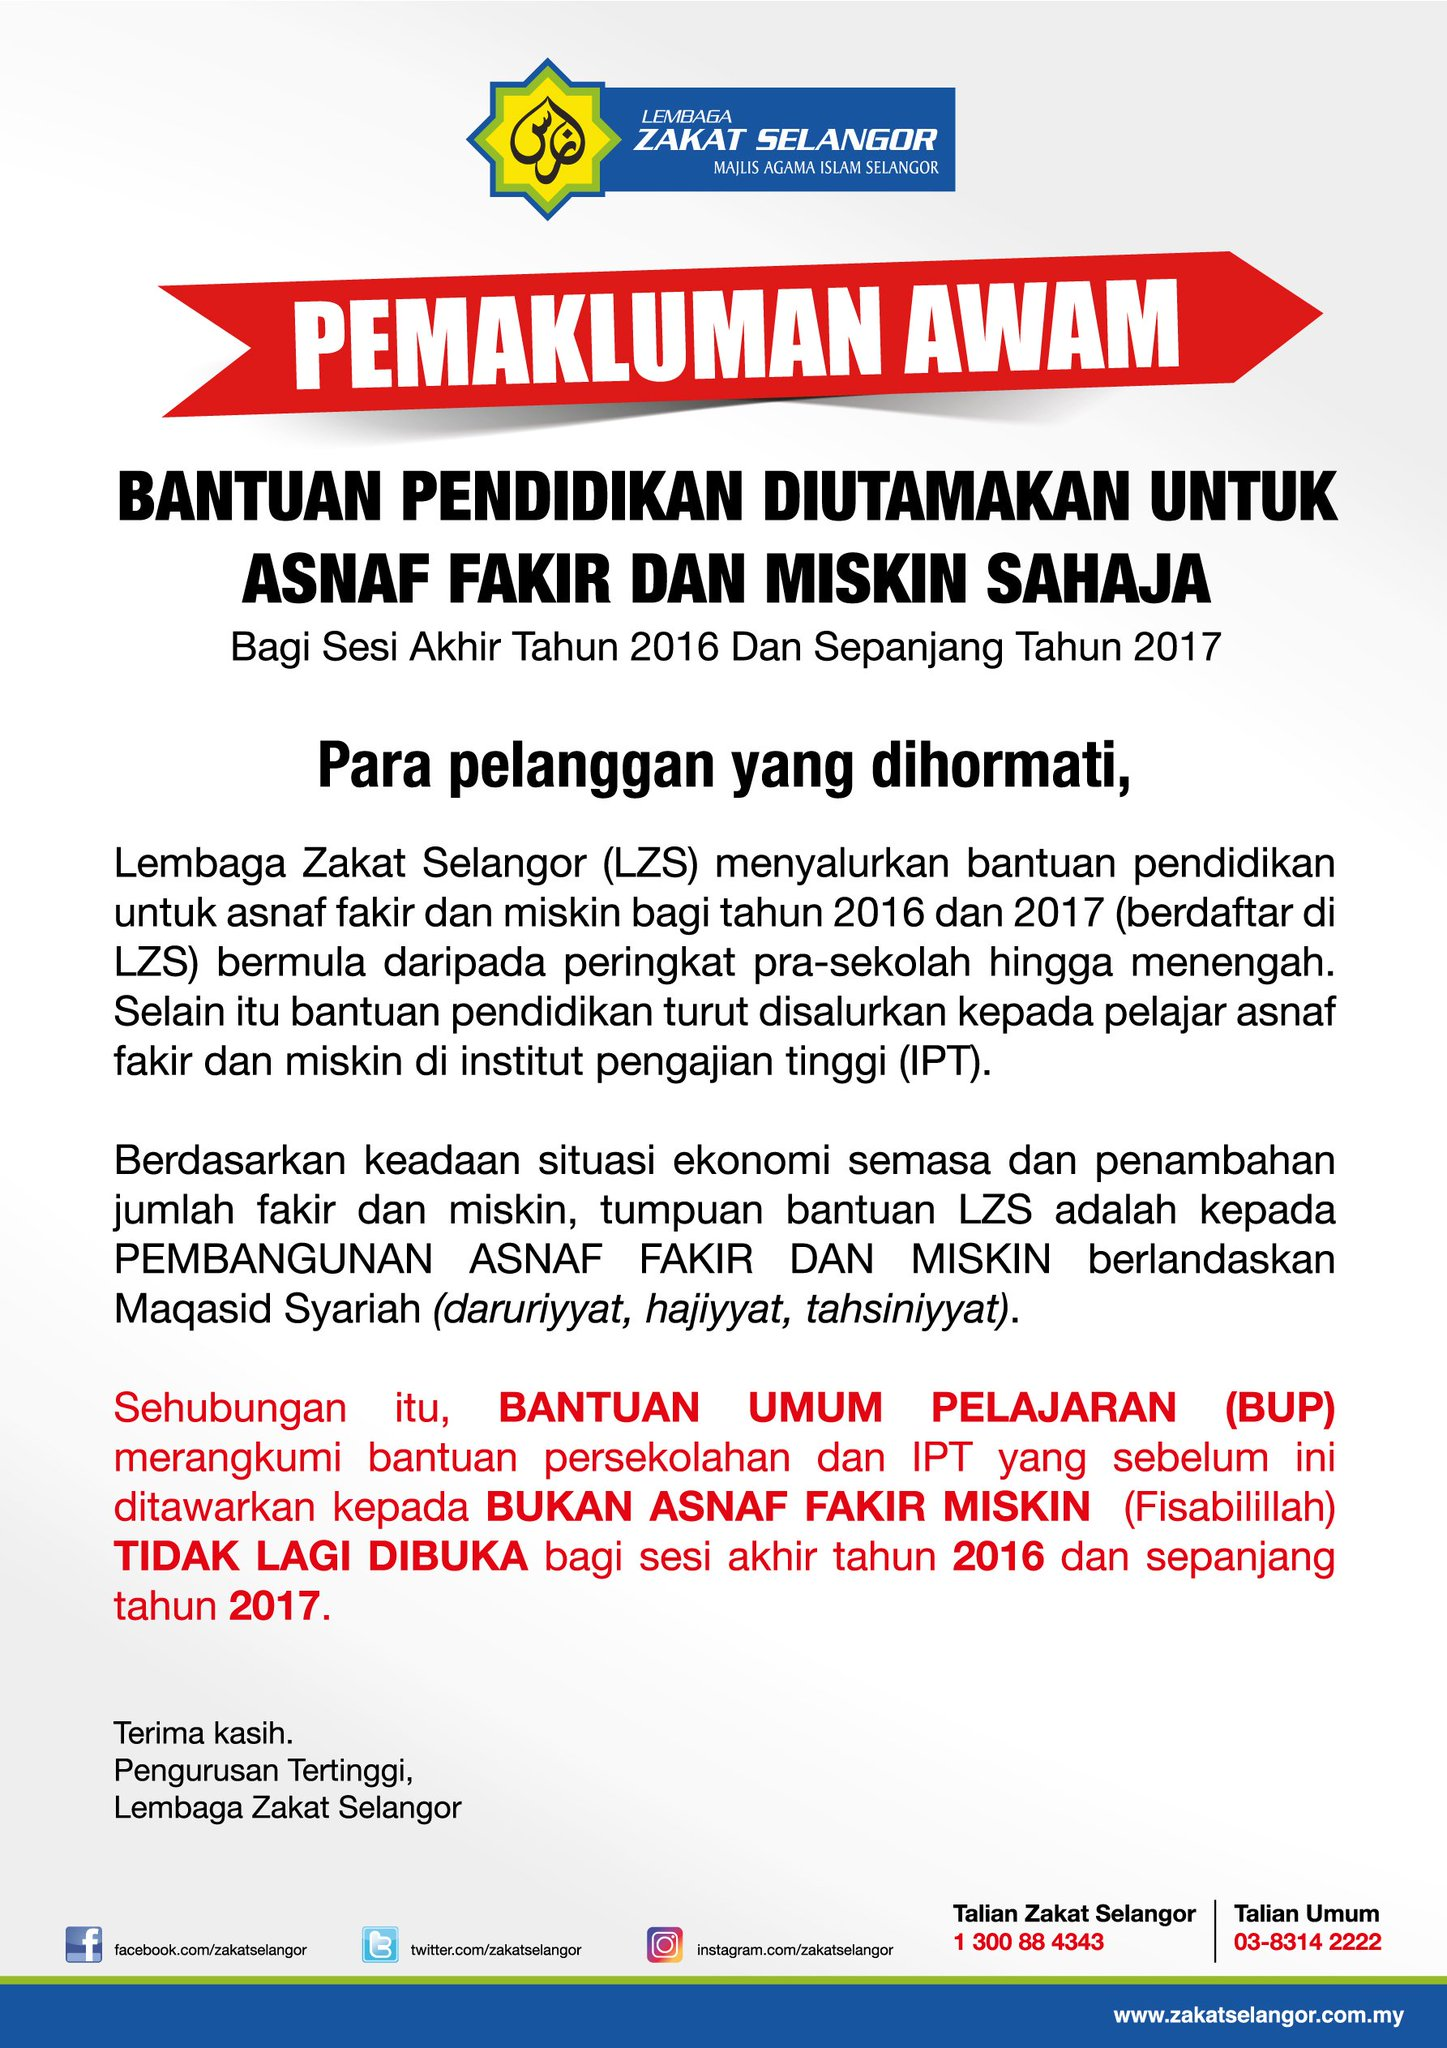 Zakat Selangor On Twitter Pengumuman Terkini Bantuan Umum Pelajaran Zakat Selangor